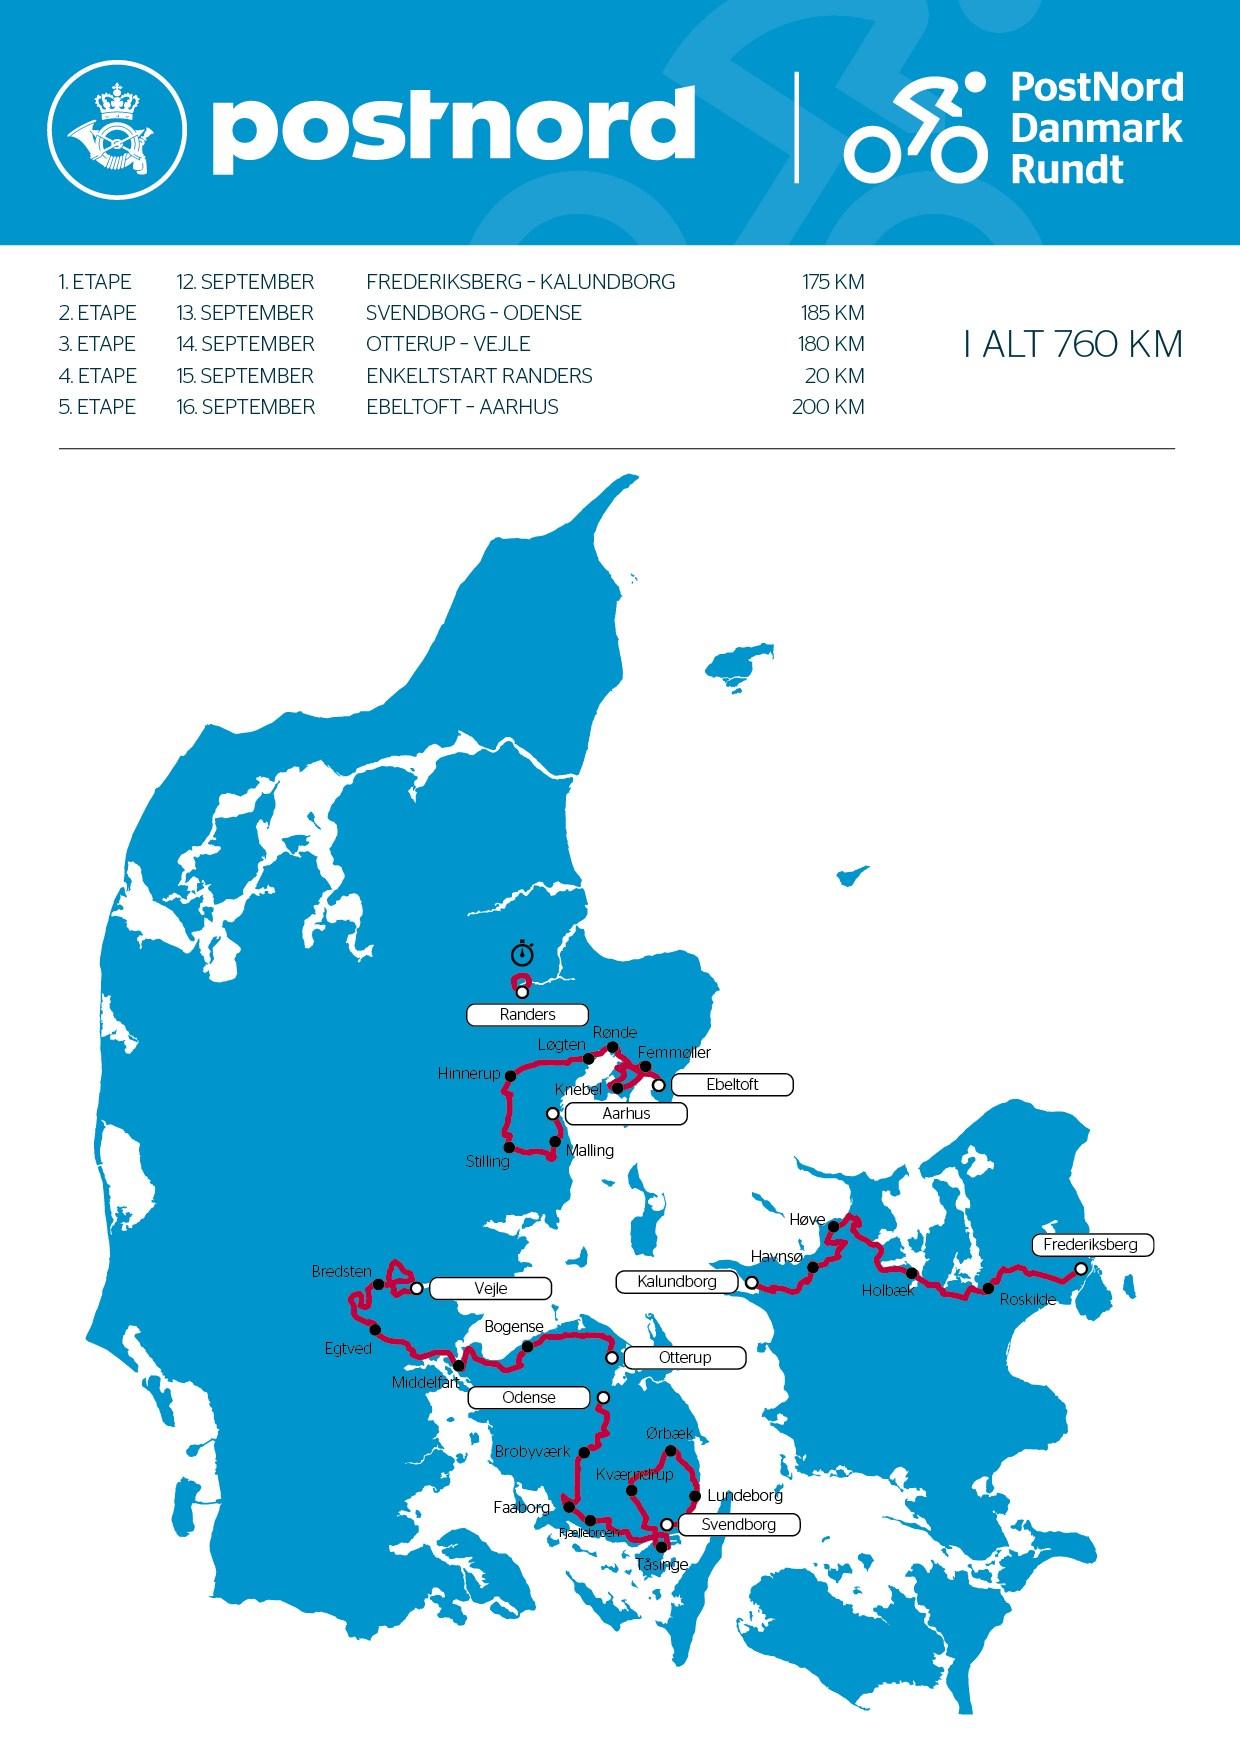 tour of denmark 2017